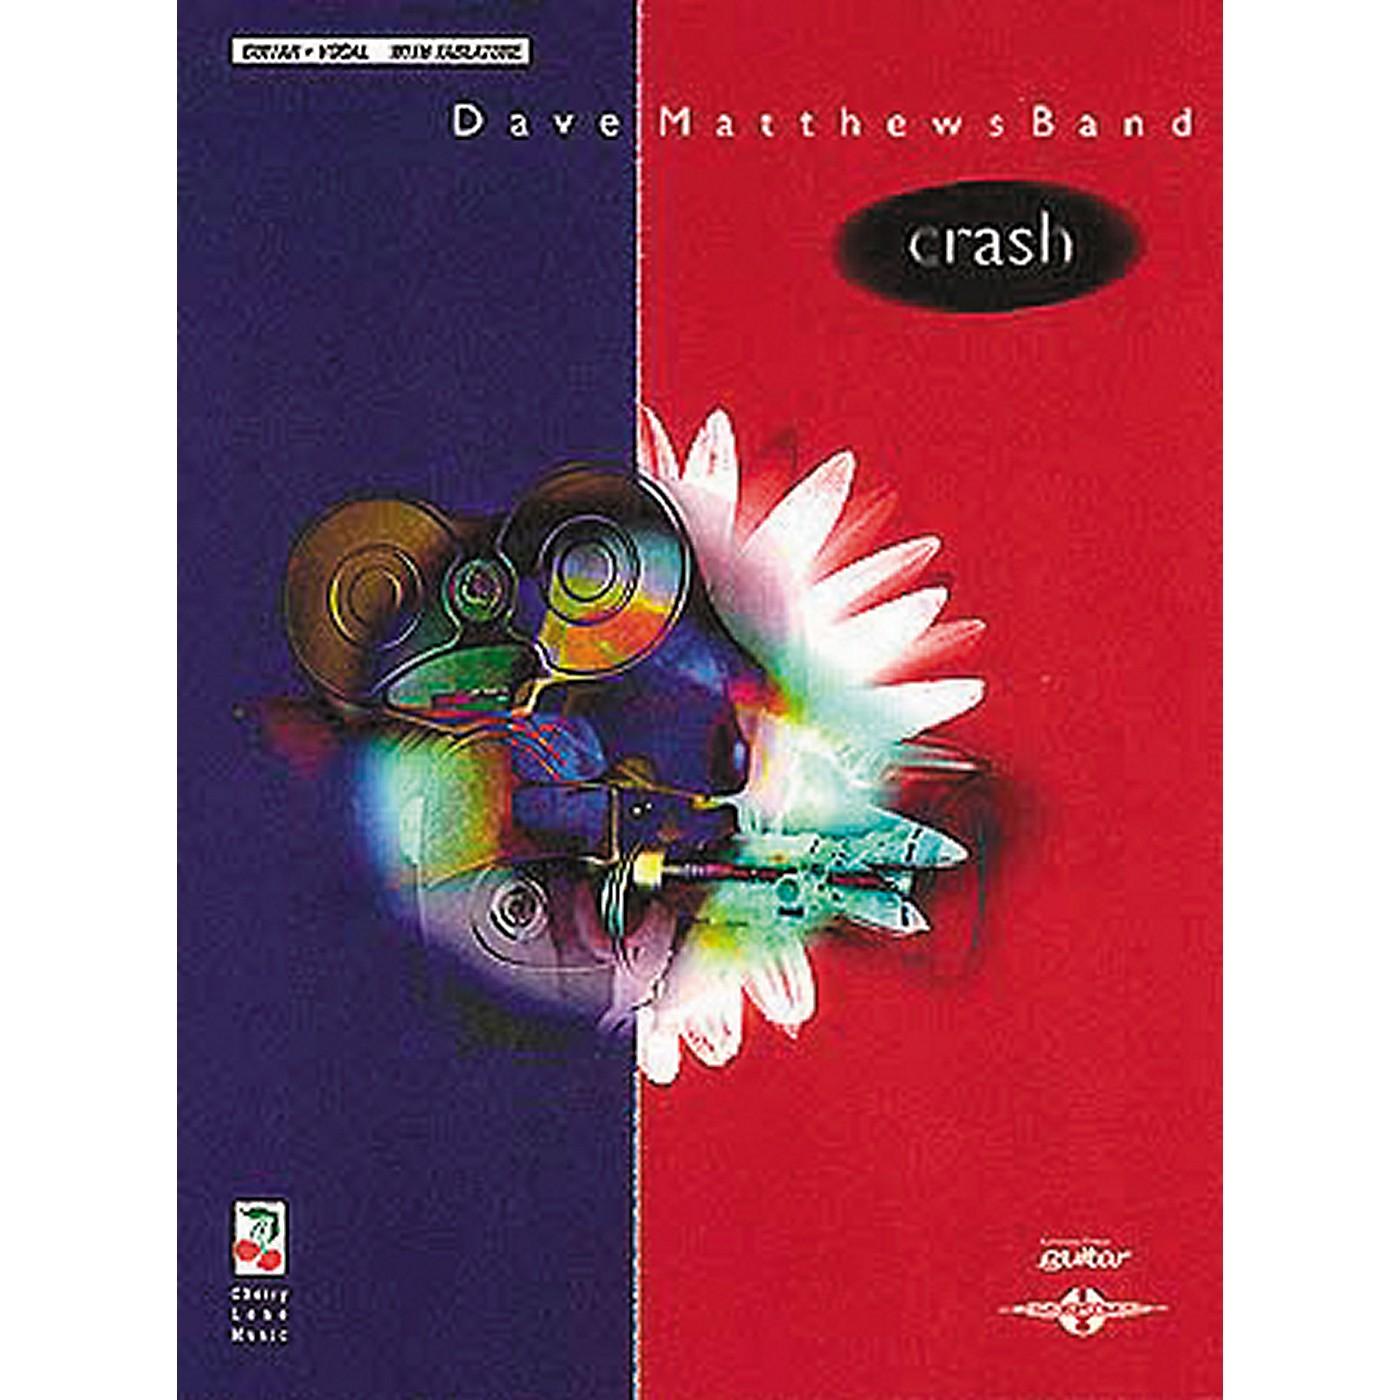 Hal Leonard Dave Matthews Band Crash Guitar Tab Songbook thumbnail